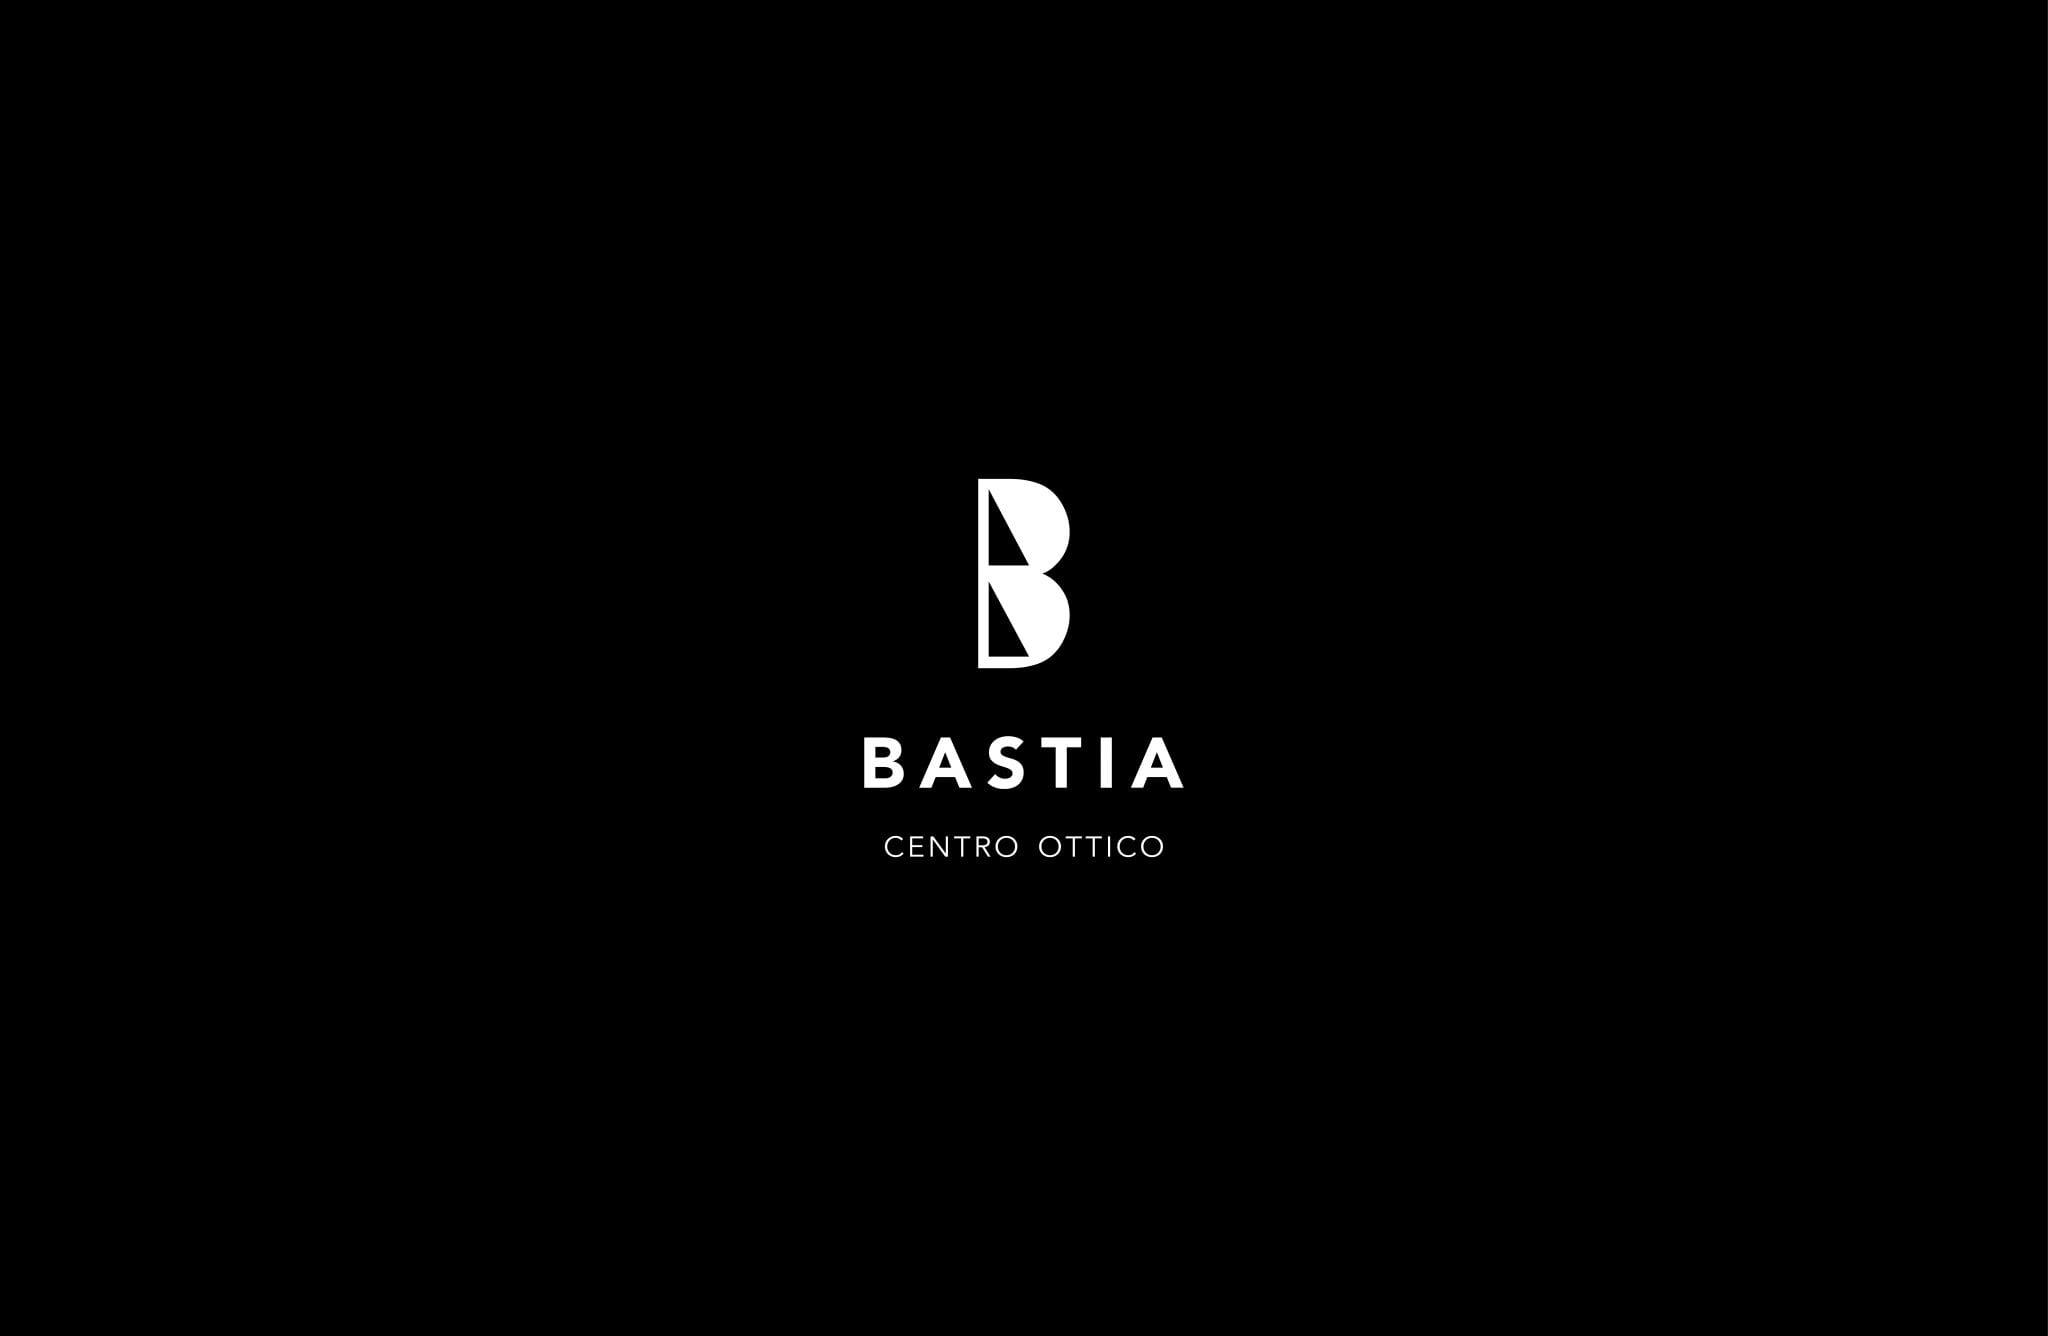 BASTIA_logo negativo